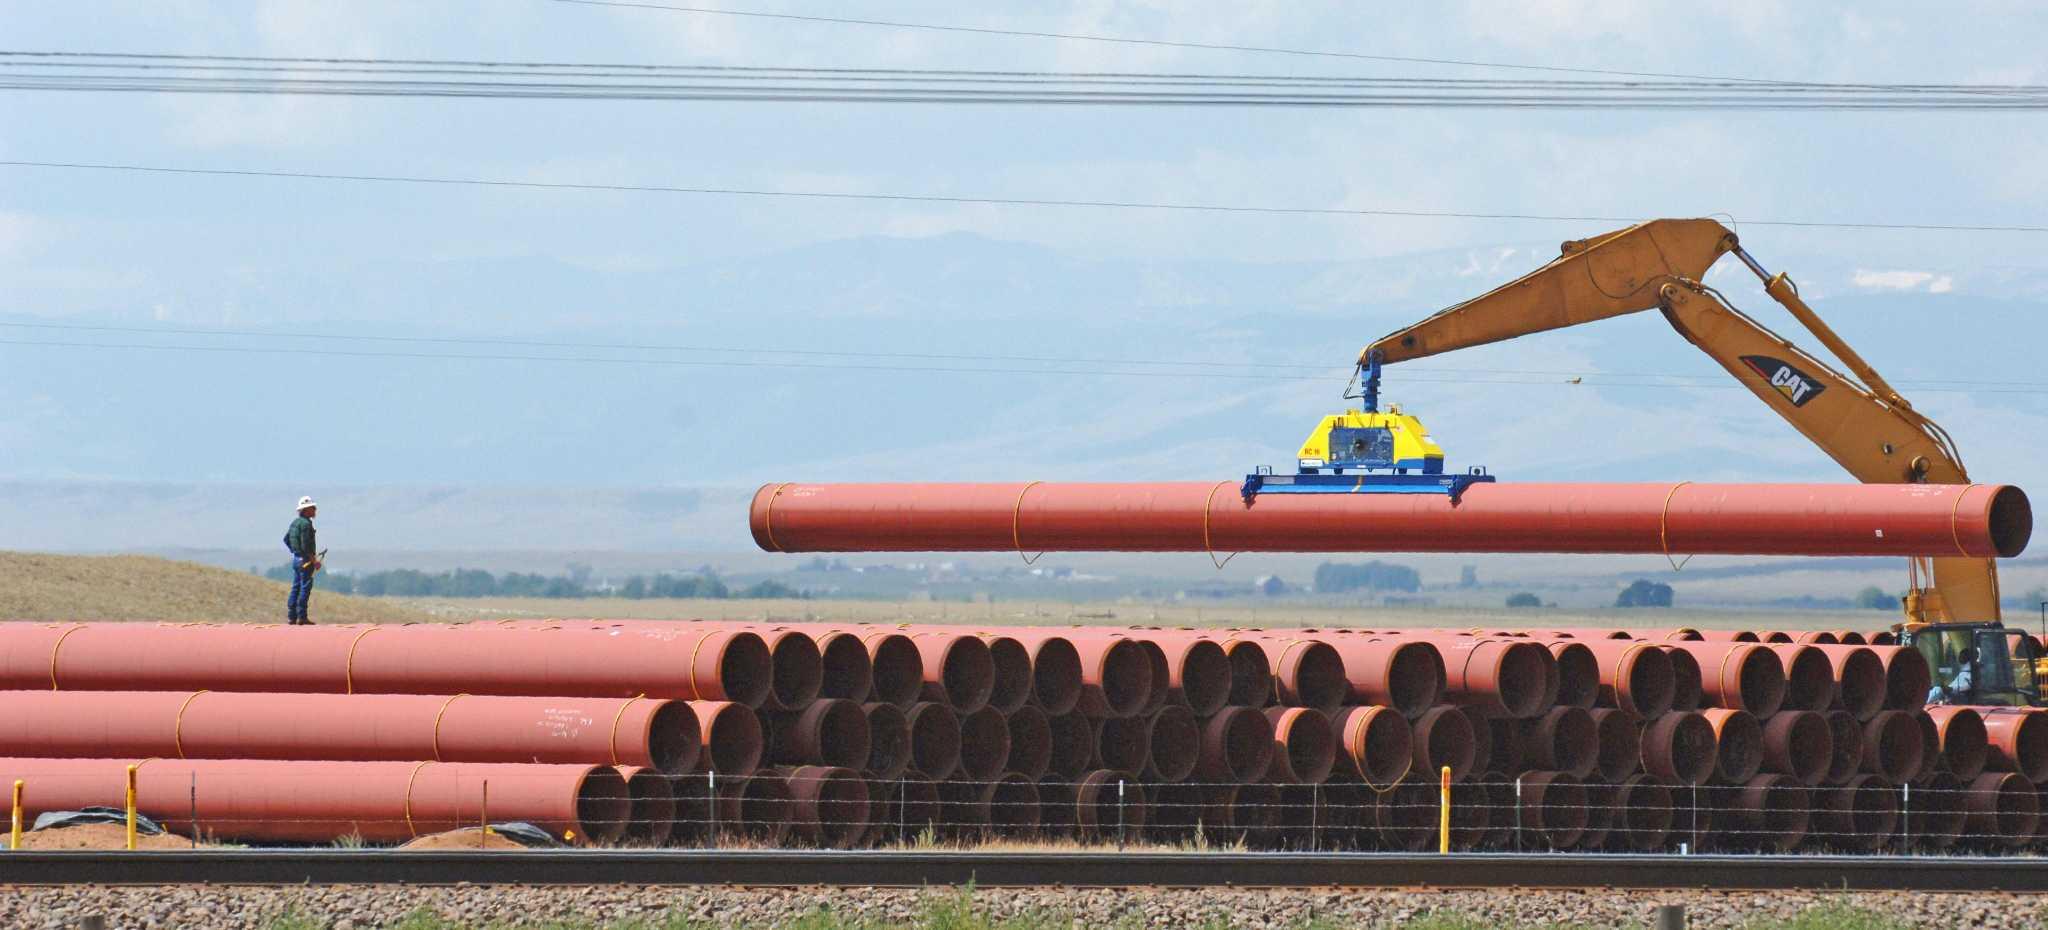 kinder morgan announces permian to corpus natural gas pipeline kinder morgan announces permian to corpus natural gas pipeline san antonio express news